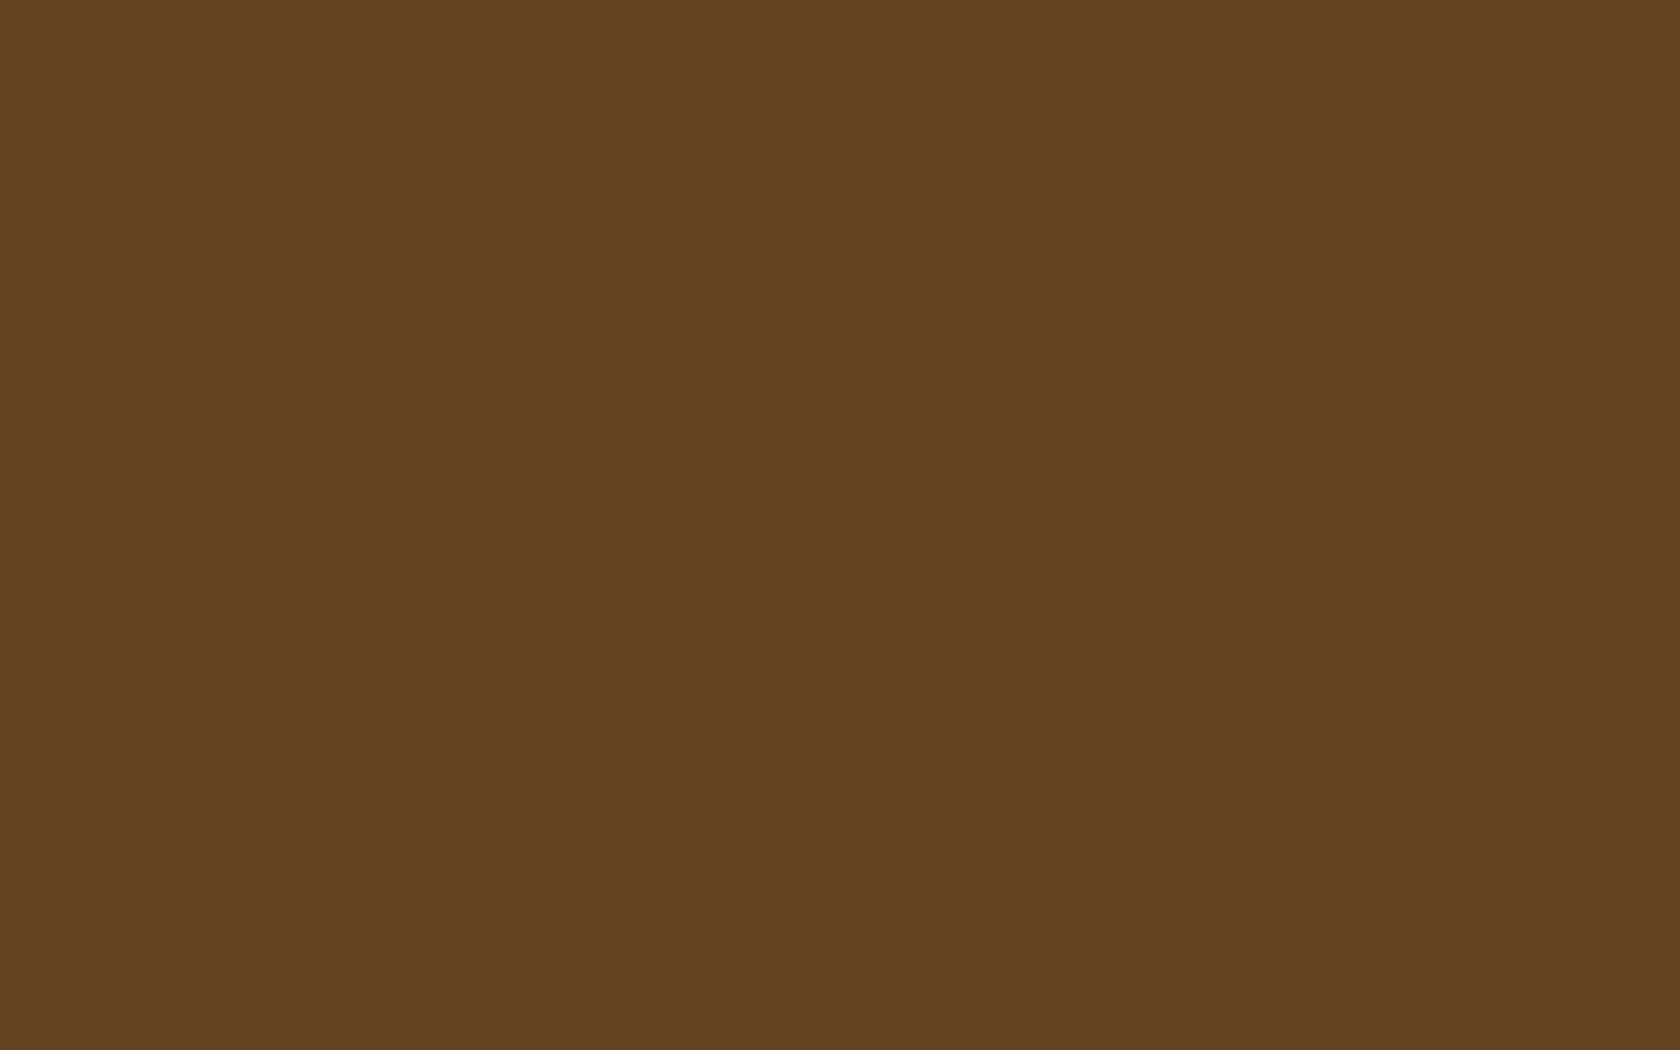 1680x1050 Dark Brown Solid Color Background